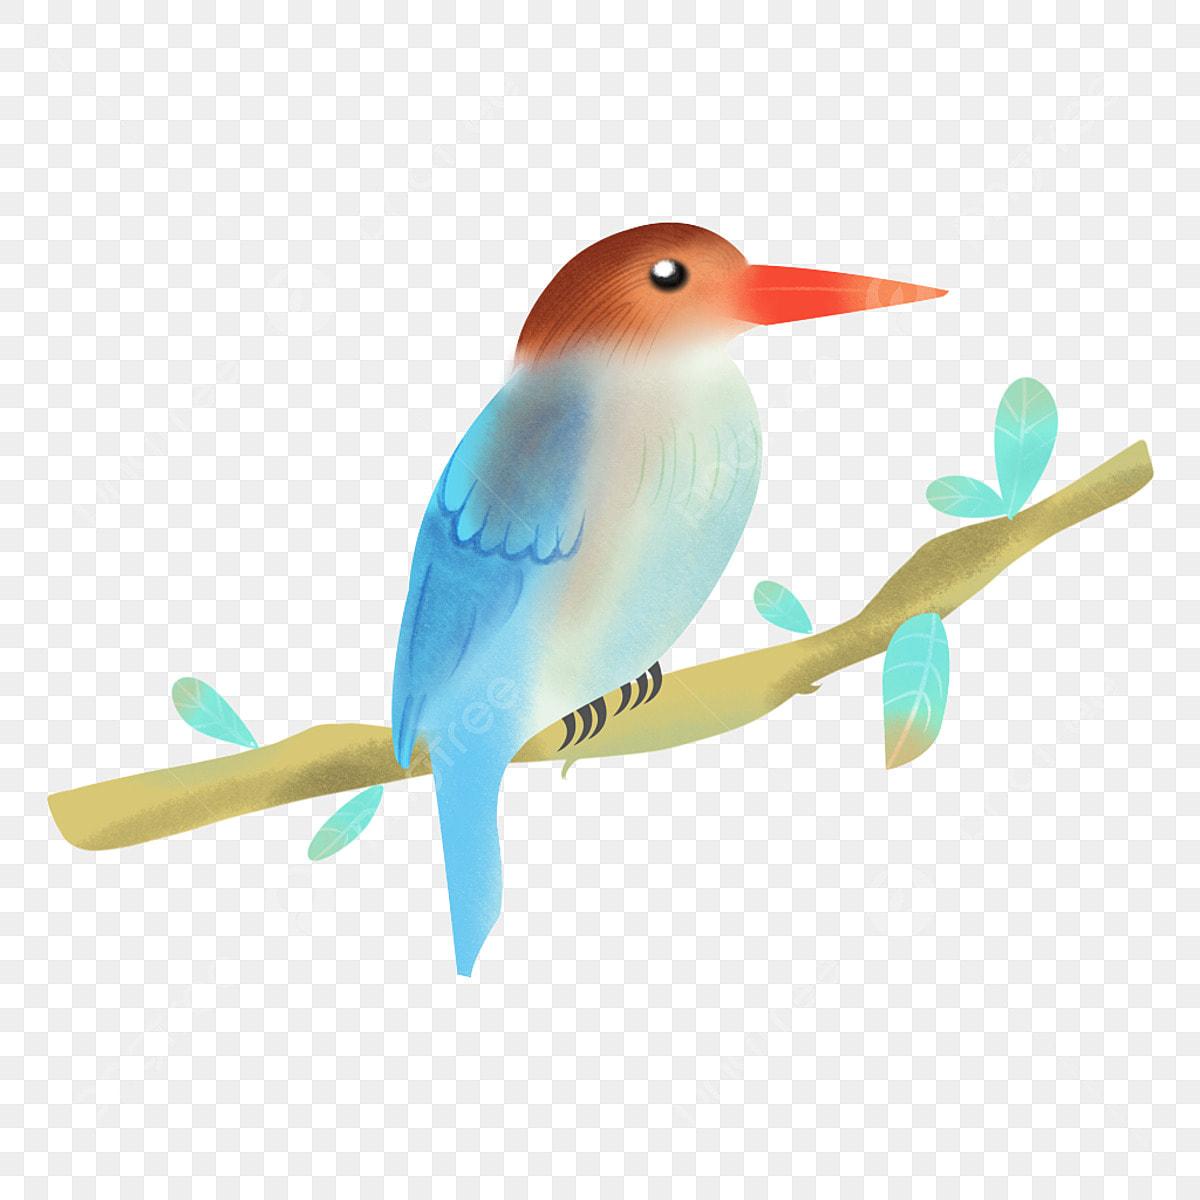 Burung Haiwan Tangan Yang Ditarik Unsur Burung Bahan